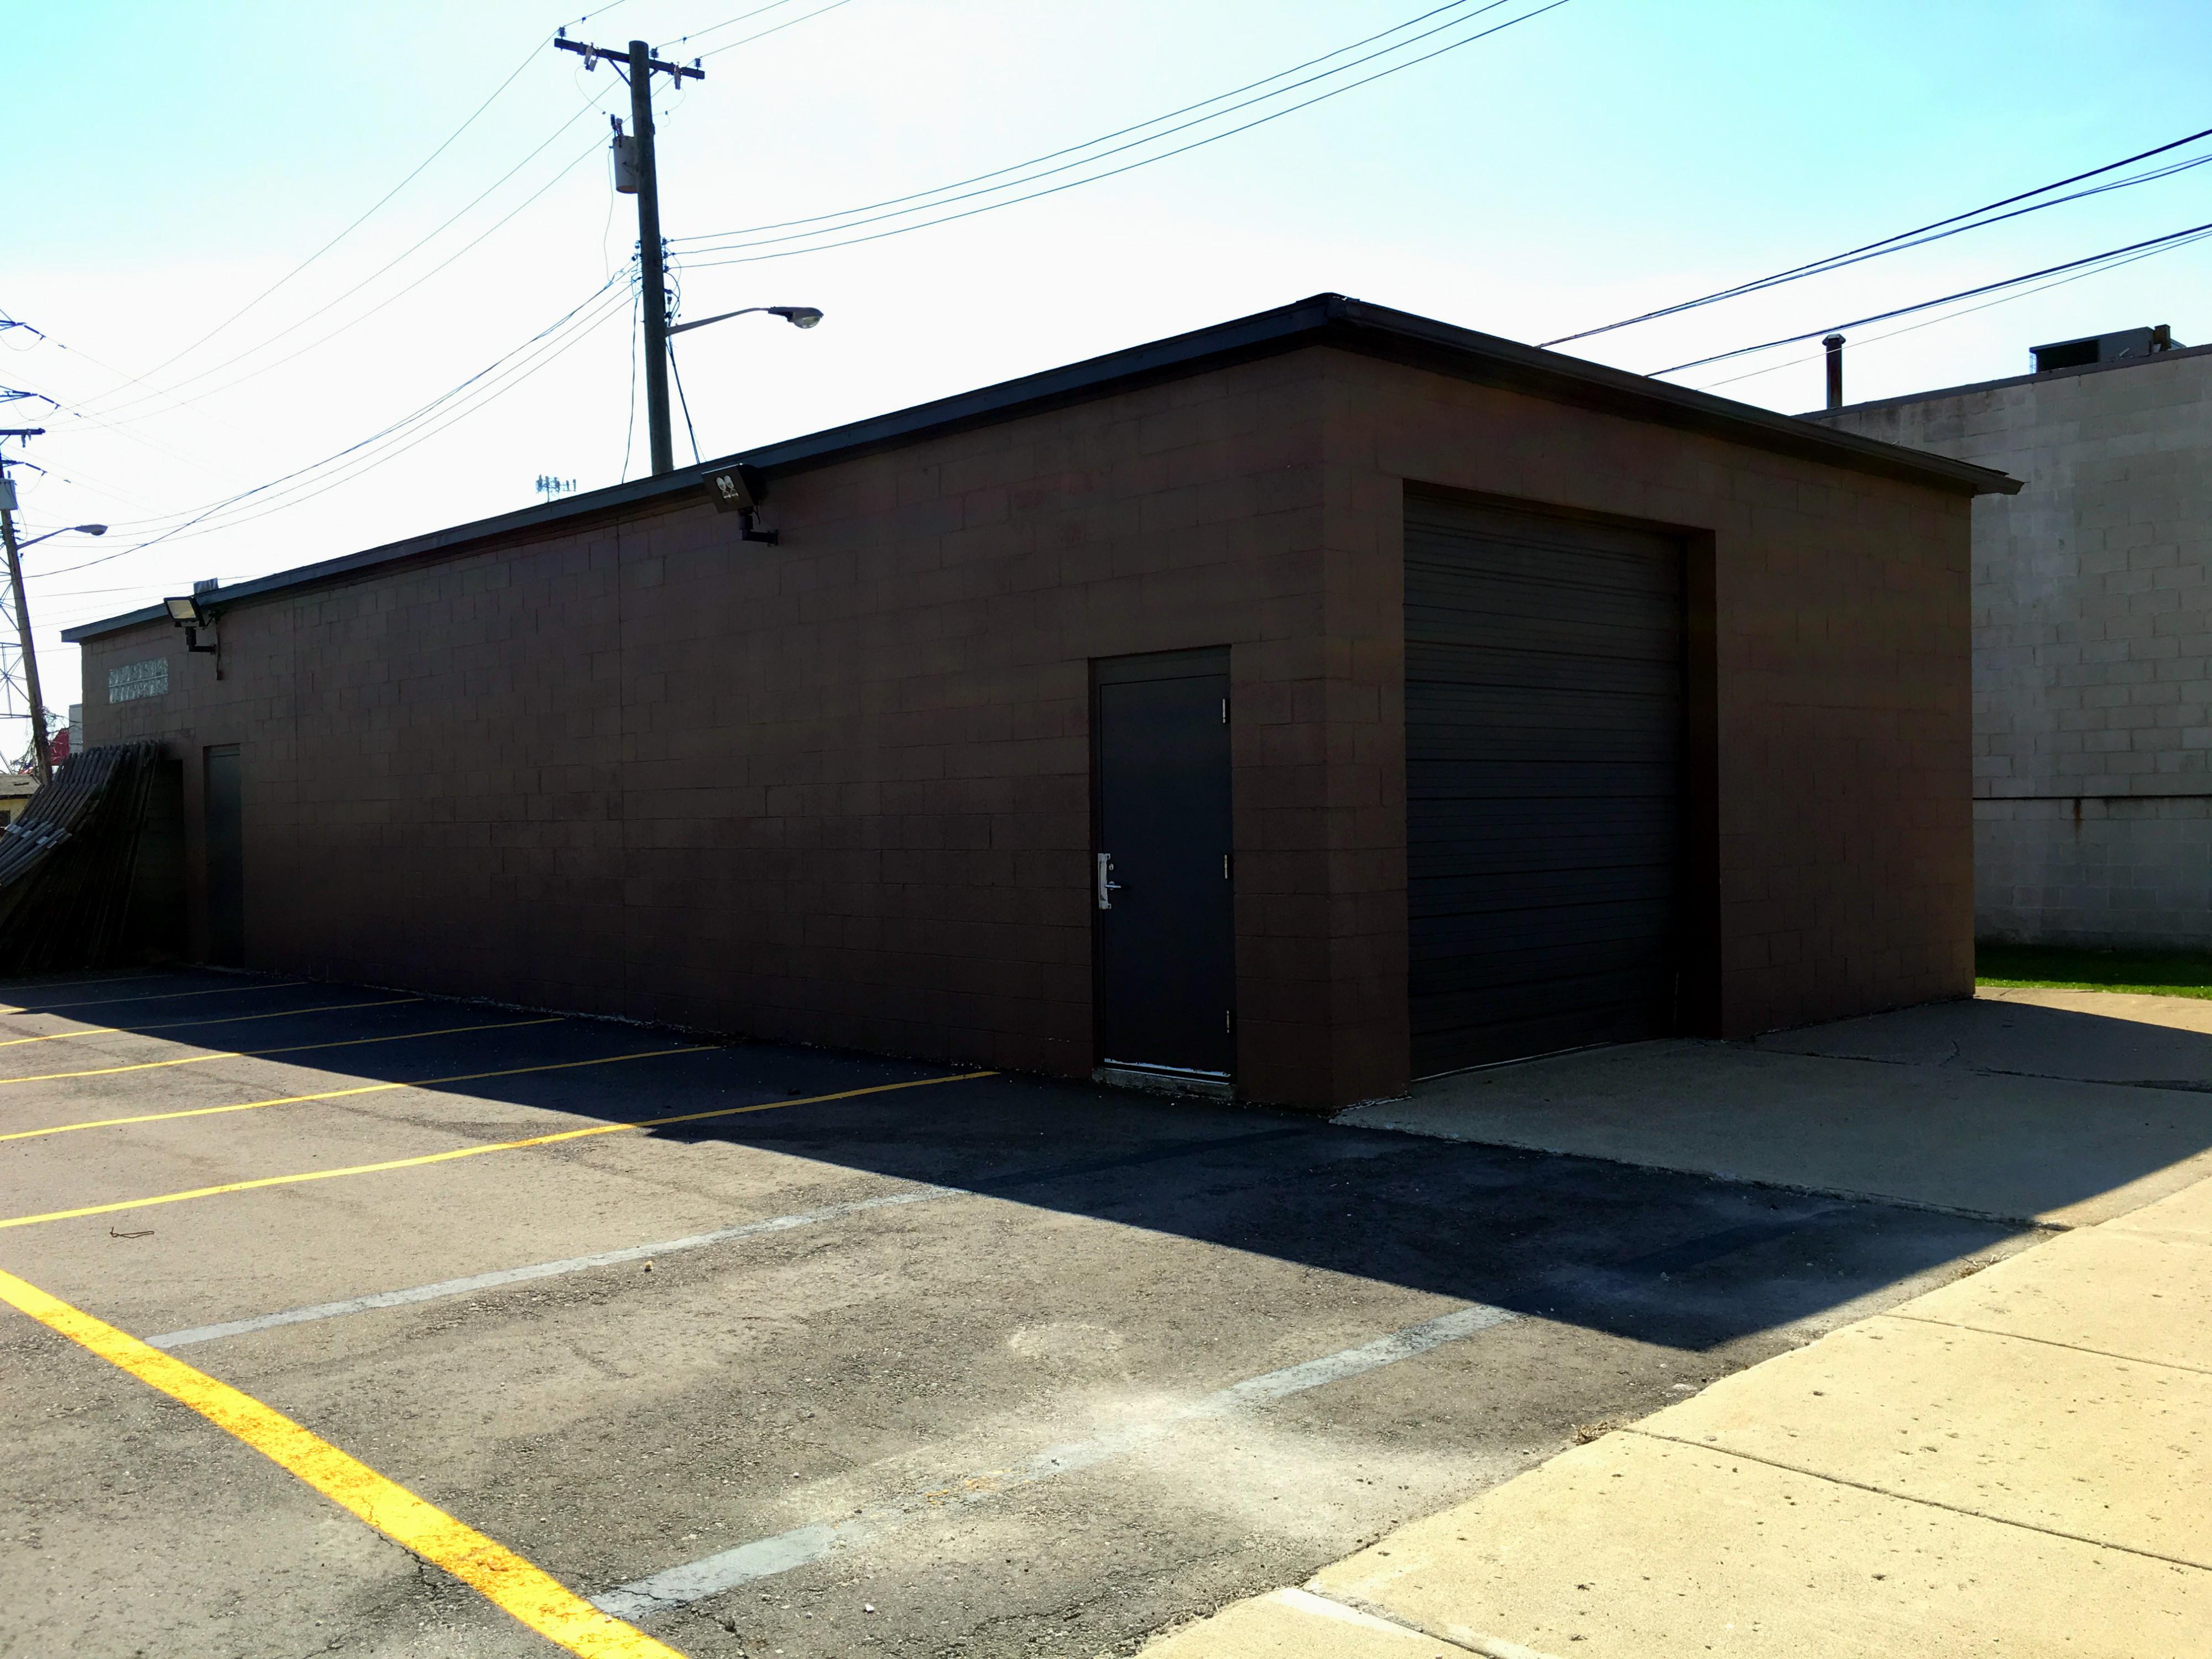 Brown building